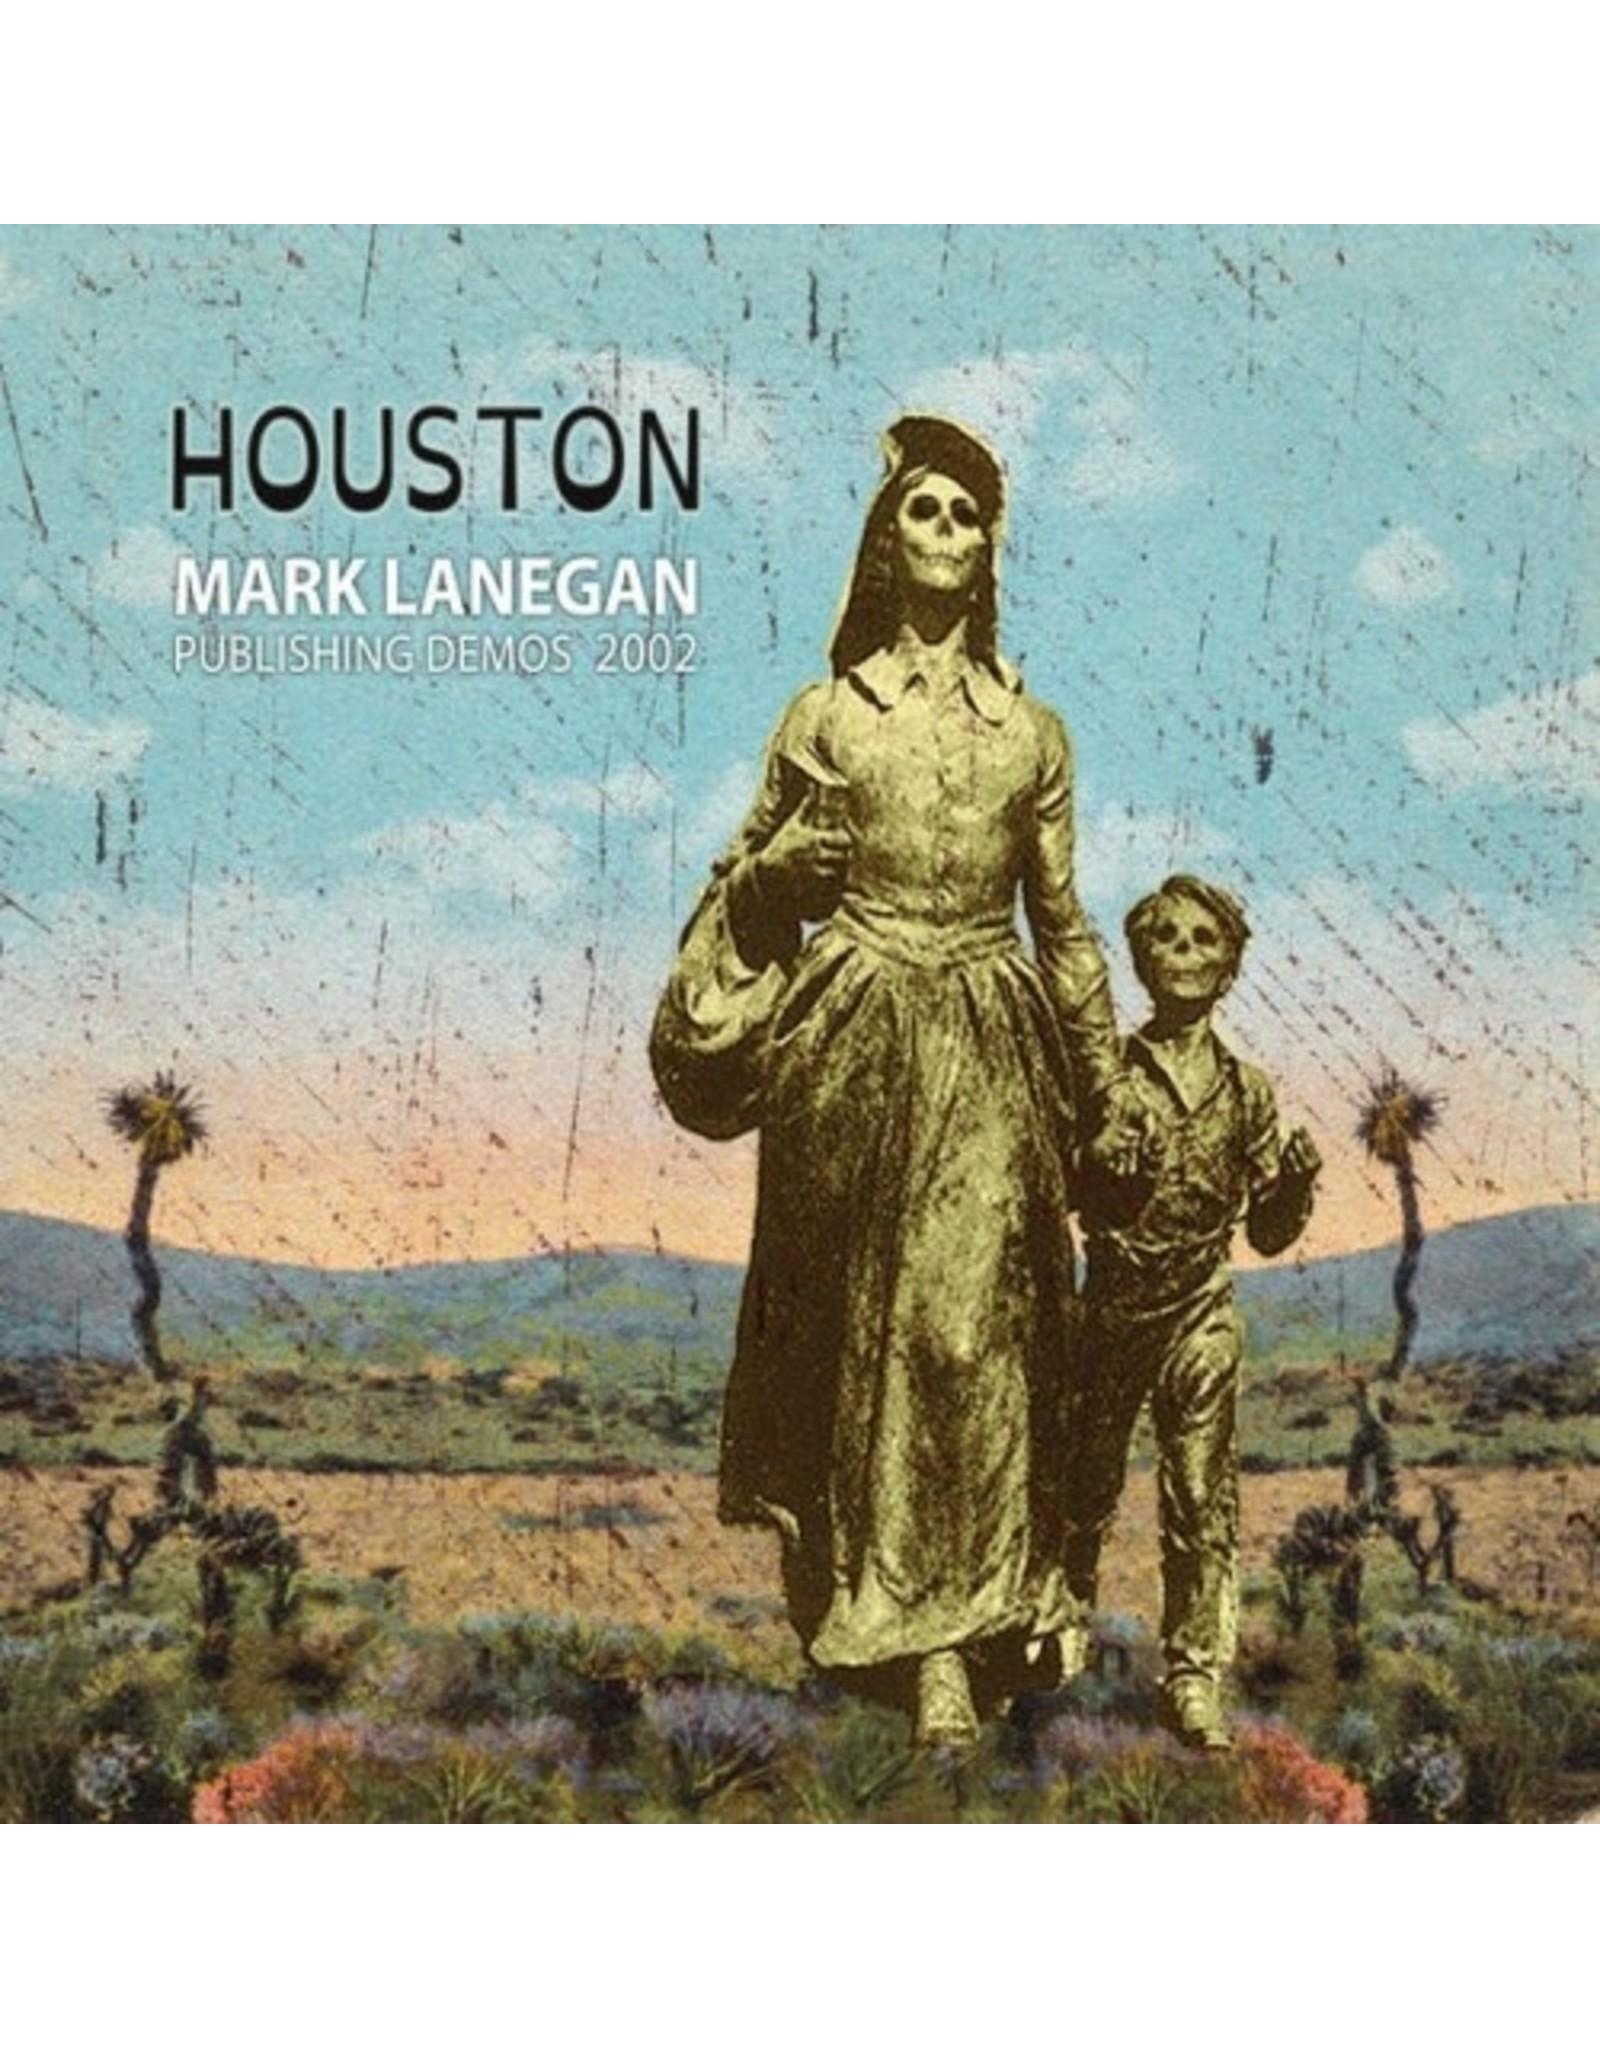 New Vinyl Mark Lanegan - Houston Publishing Demos 2002 LP